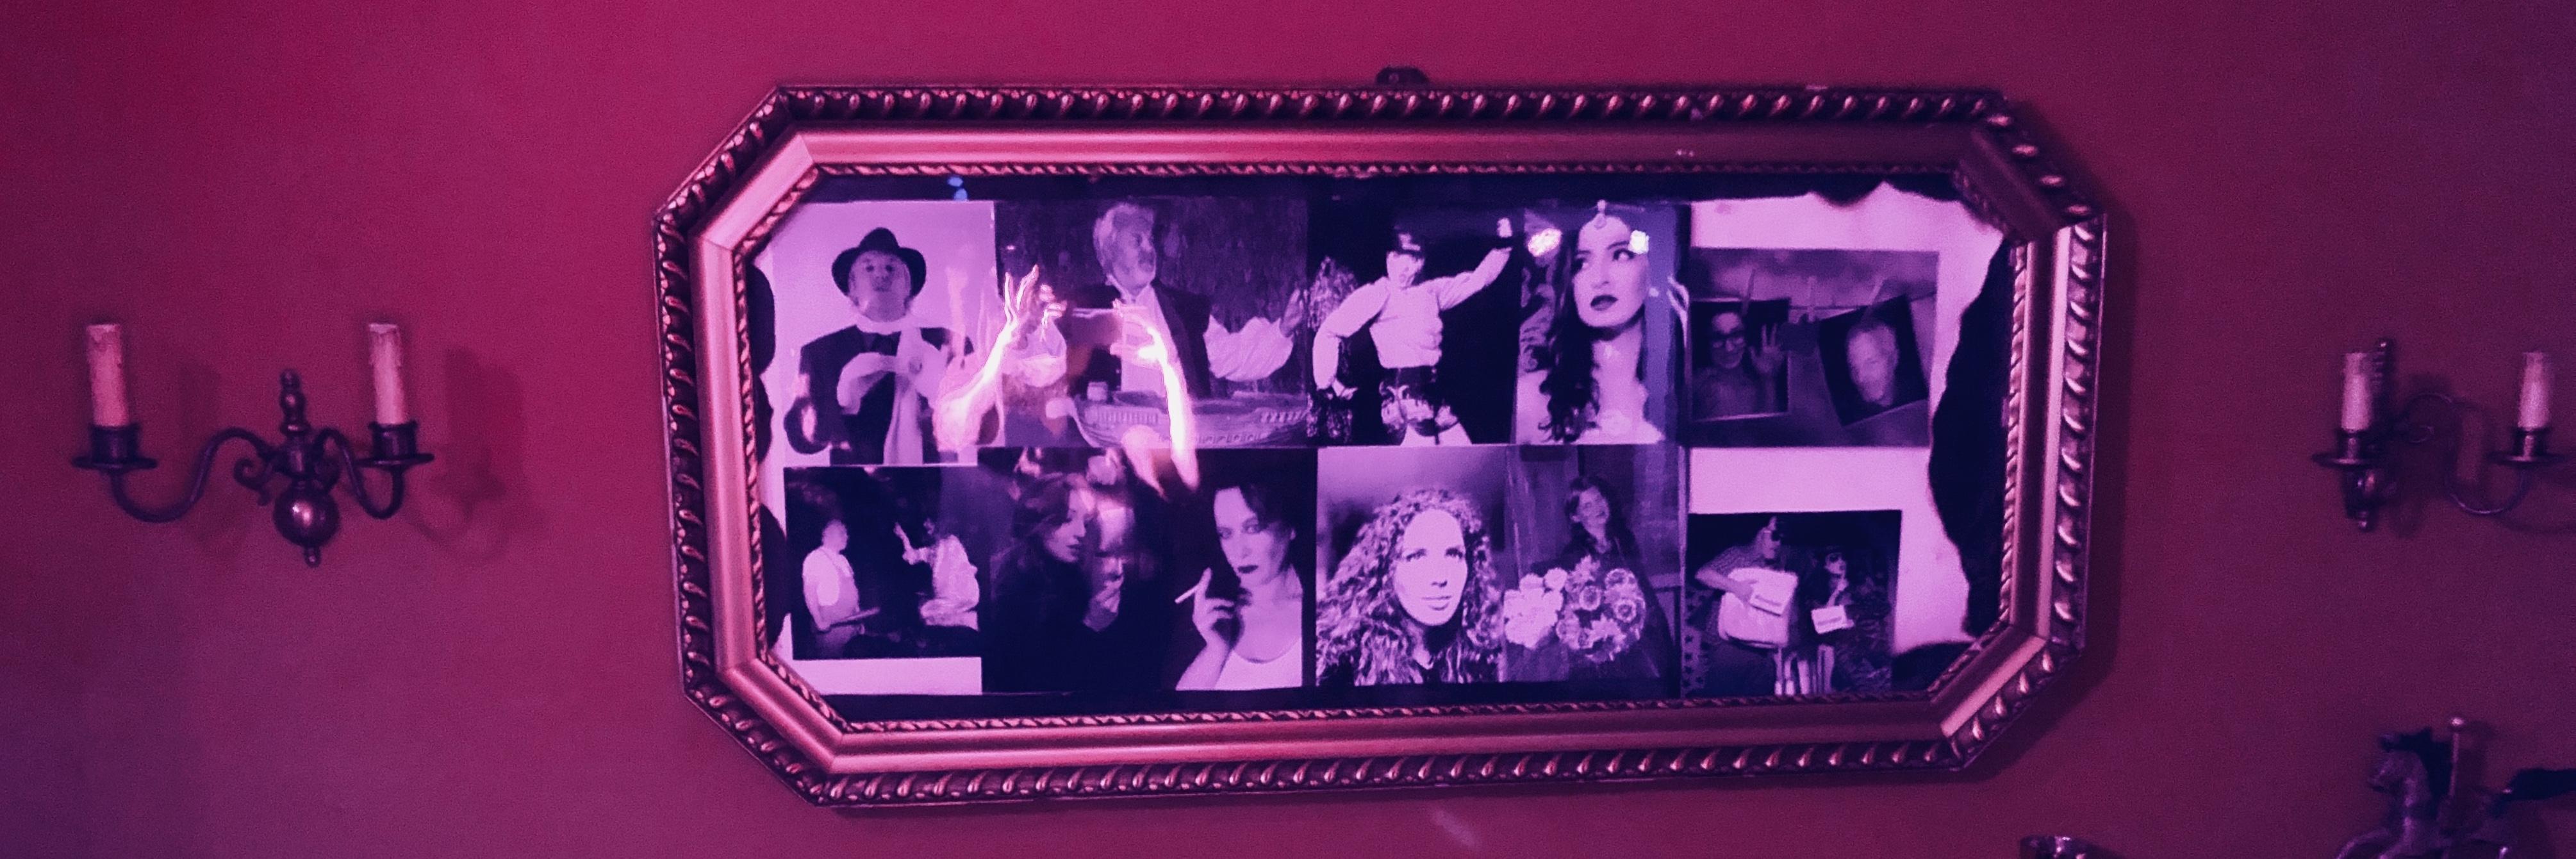 Special Events Bilder-Slider